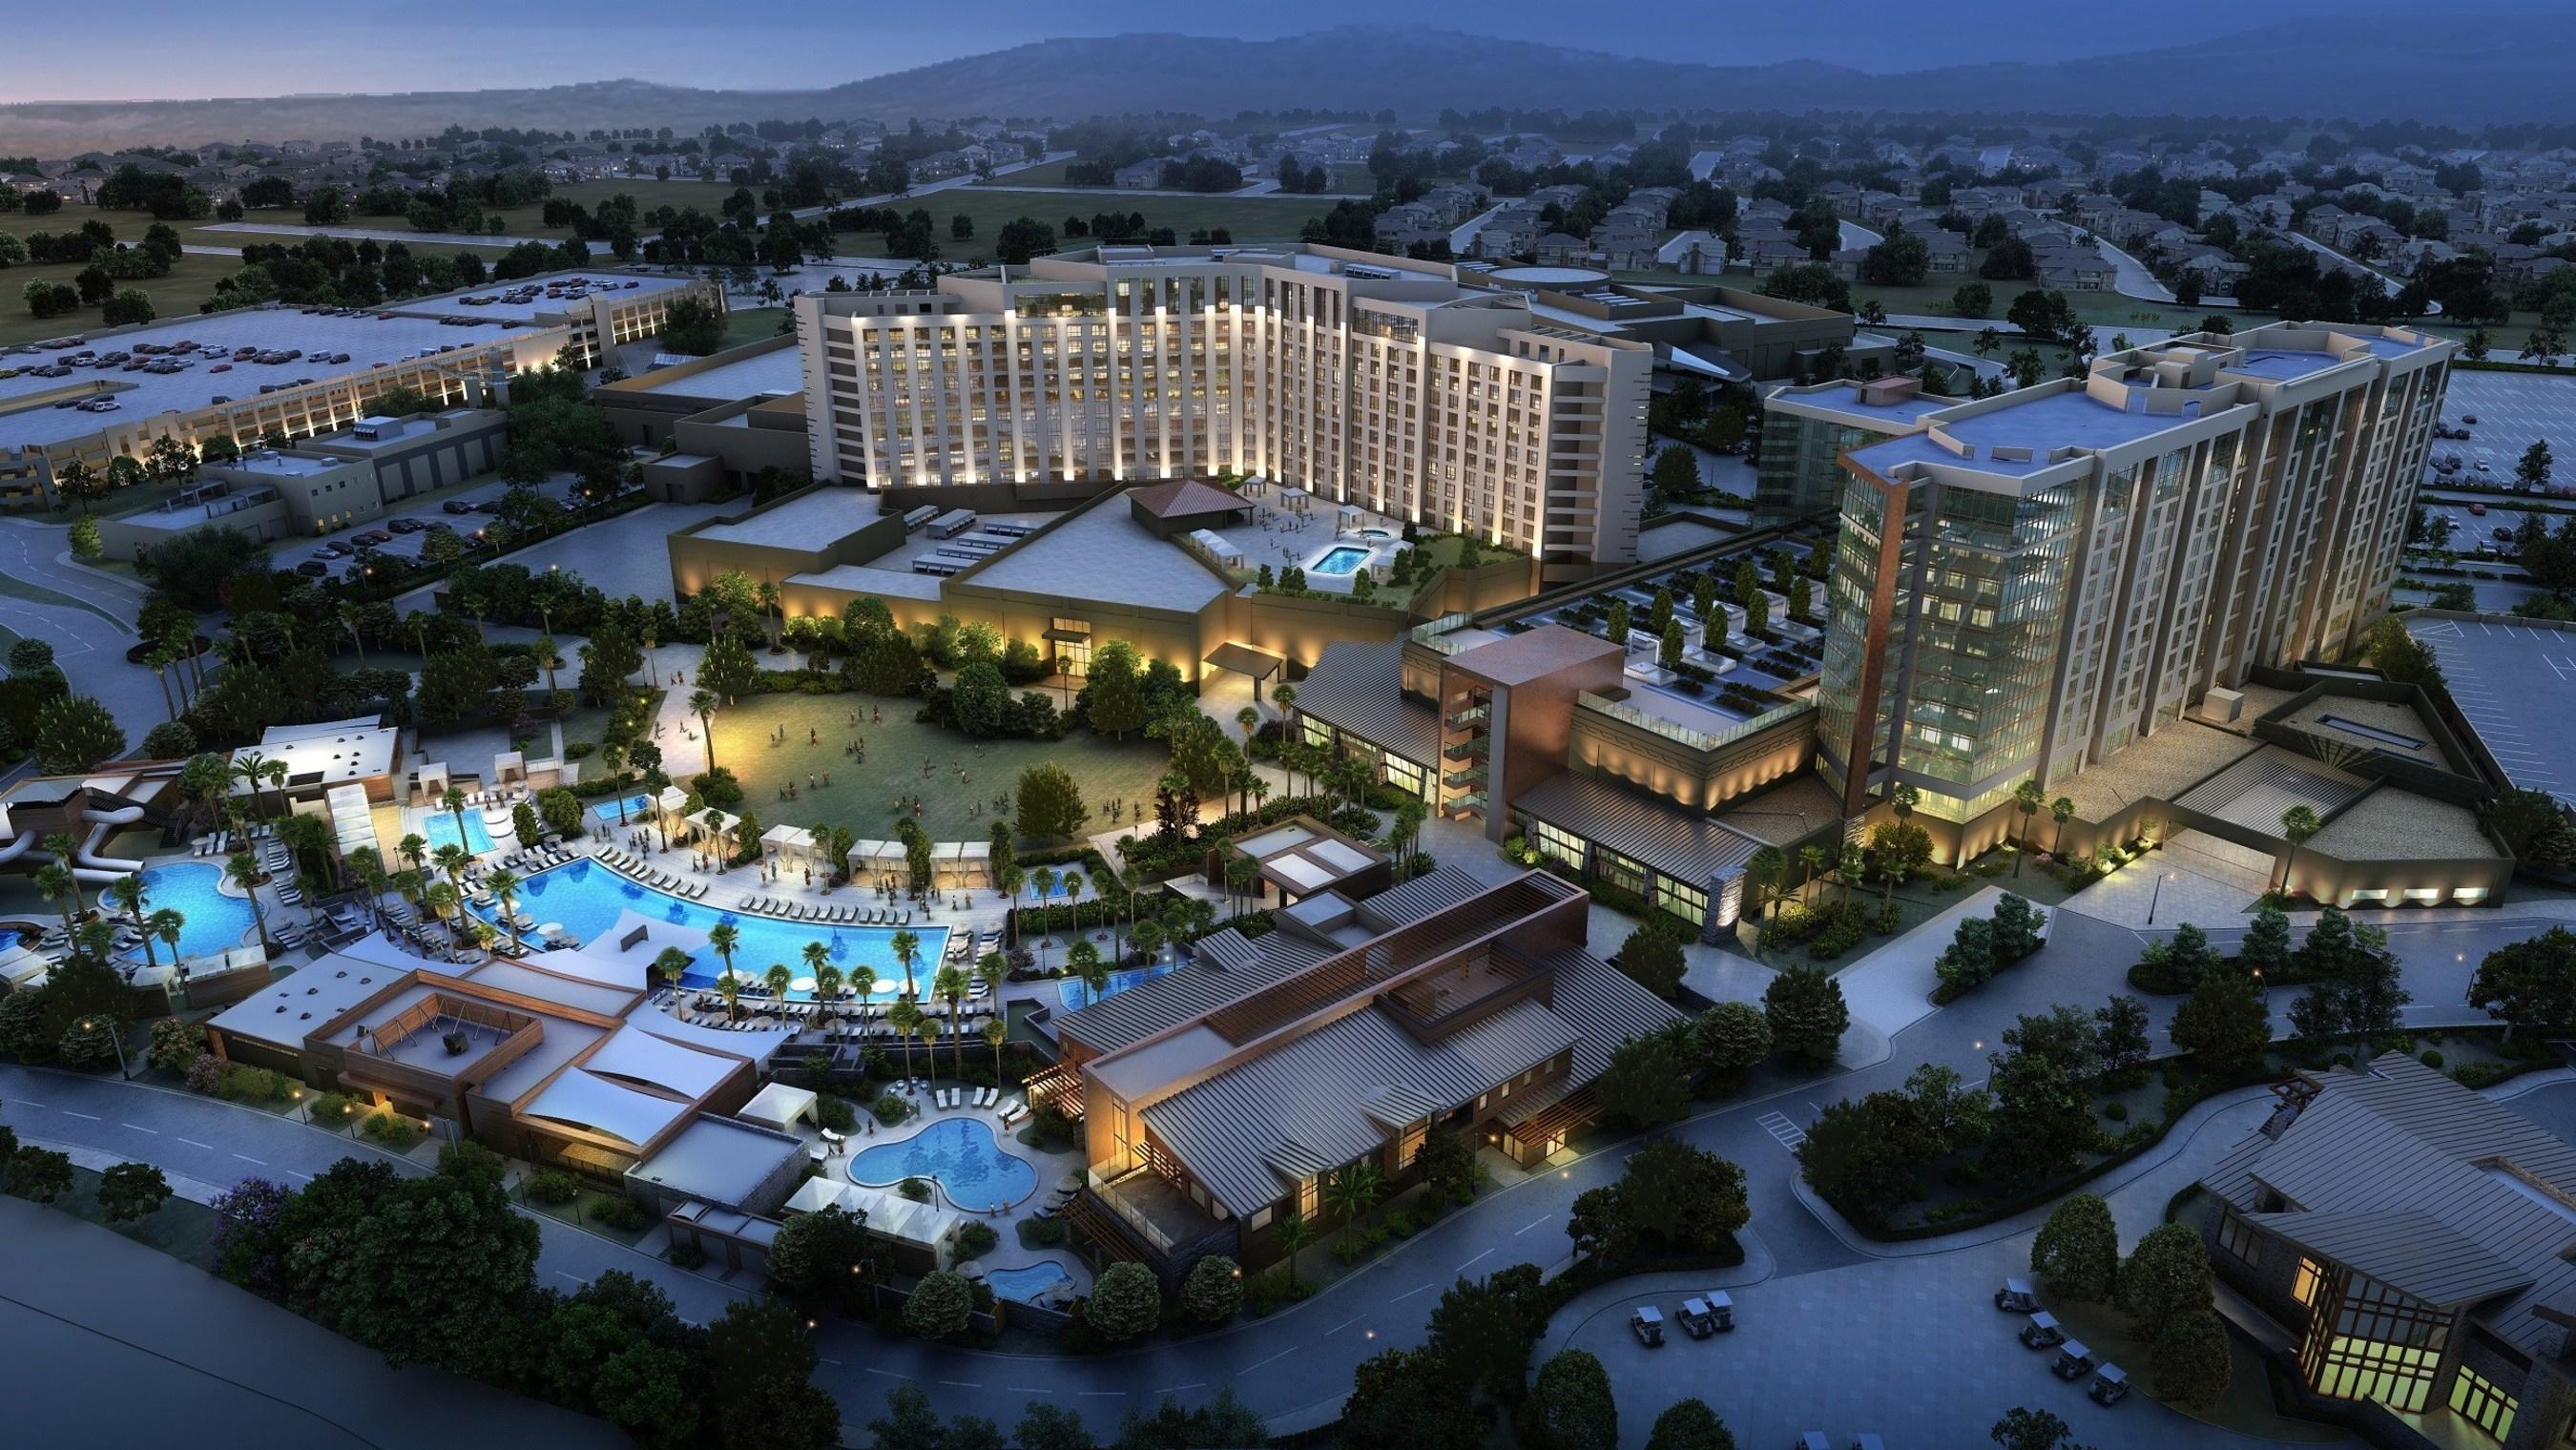 Pechanga Resort & Casino Breaks Ground On $285 Million Resort Expansion,  Ushers In Thousands Of Jobs